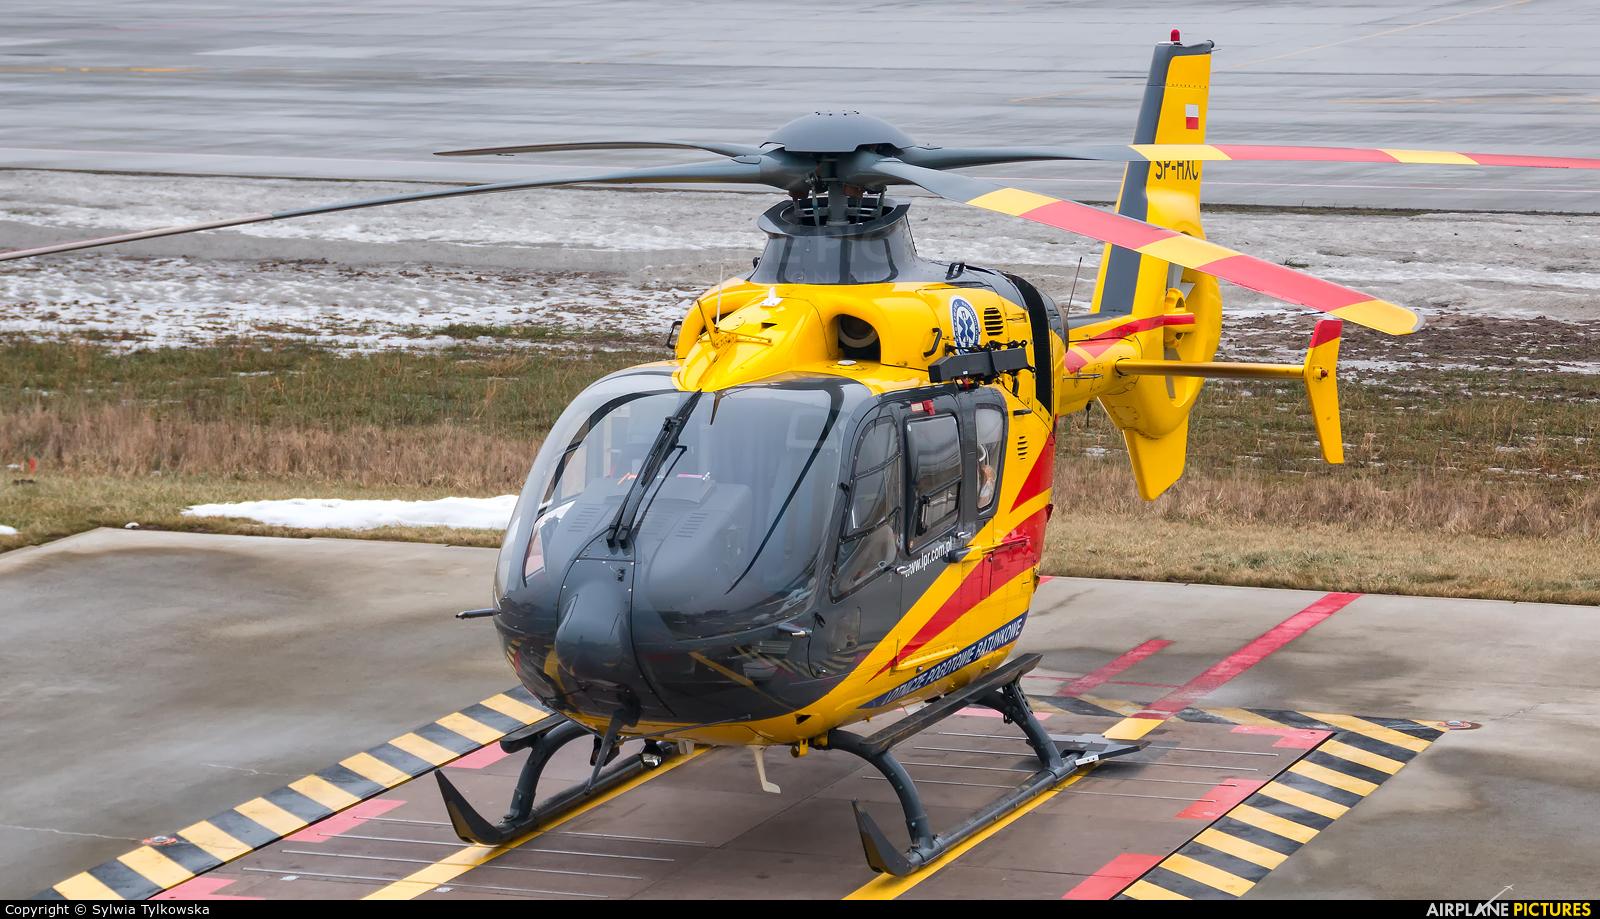 Polish Medical Air Rescue - Lotnicze Pogotowie Ratunkowe SP-HXC aircraft at Kraków - John Paul II Intl